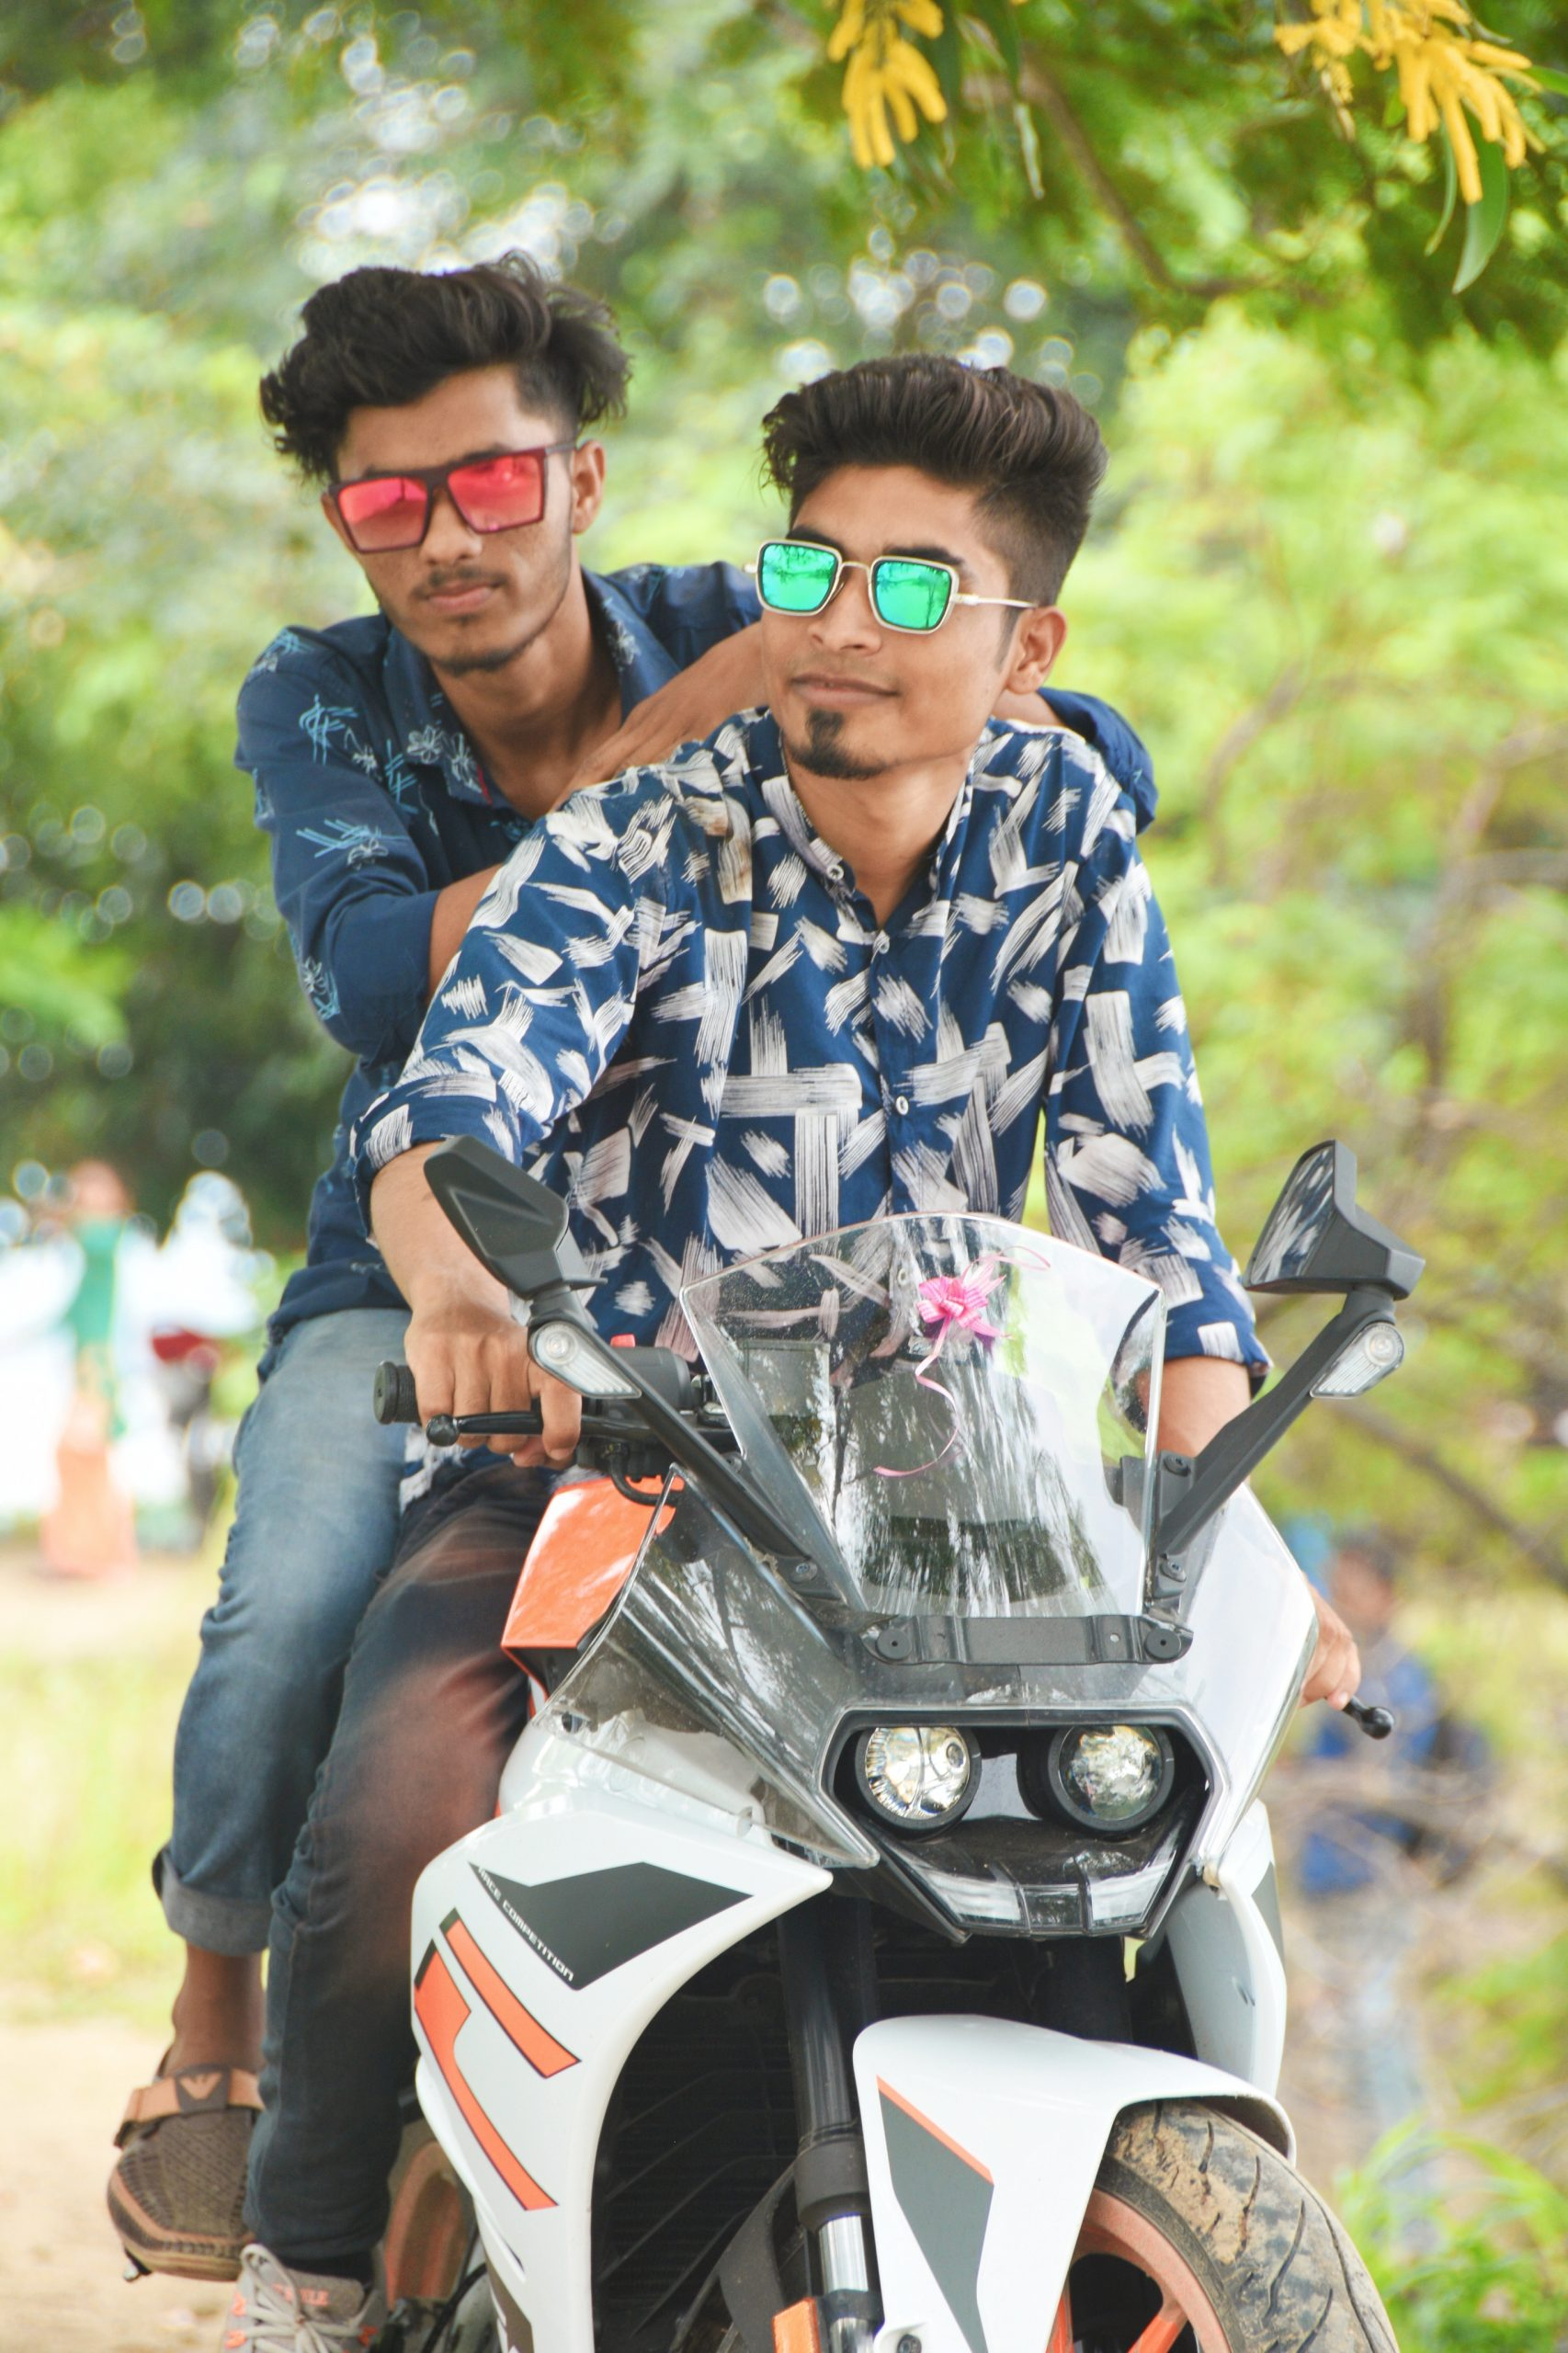 Boys on a bike